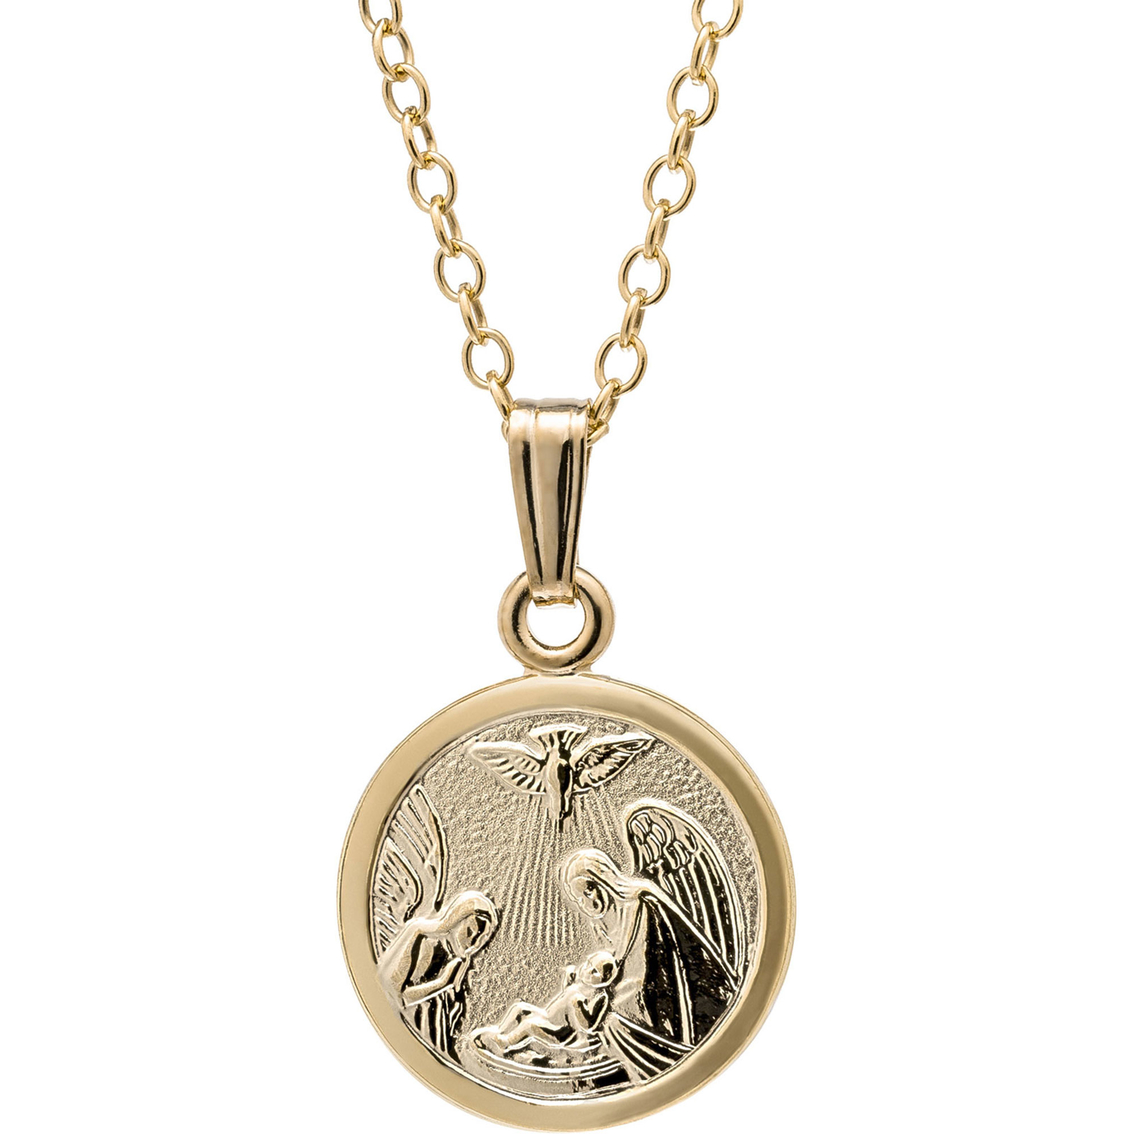 Kids 14k Gold Filled Guardian Angel Baptism Pendant | Children's Necklaces  & Pendants | Jewelry & Watches | Shop The Exchange